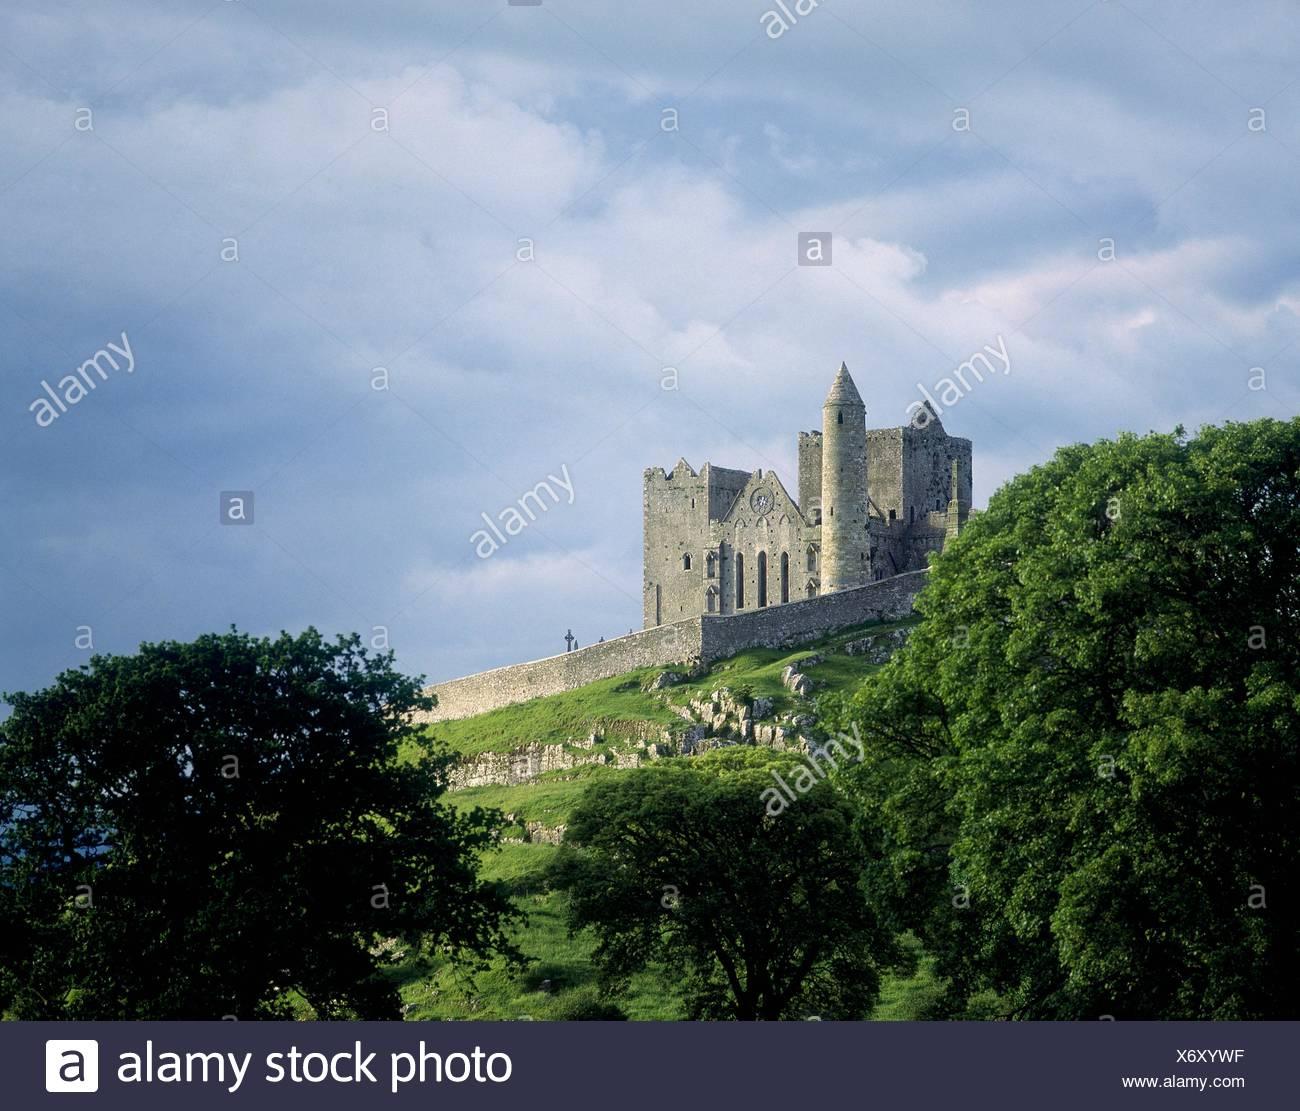 Cashel Rock Monastic Settlement, Cahel, Co Tipperary, Ireland - Stock Image